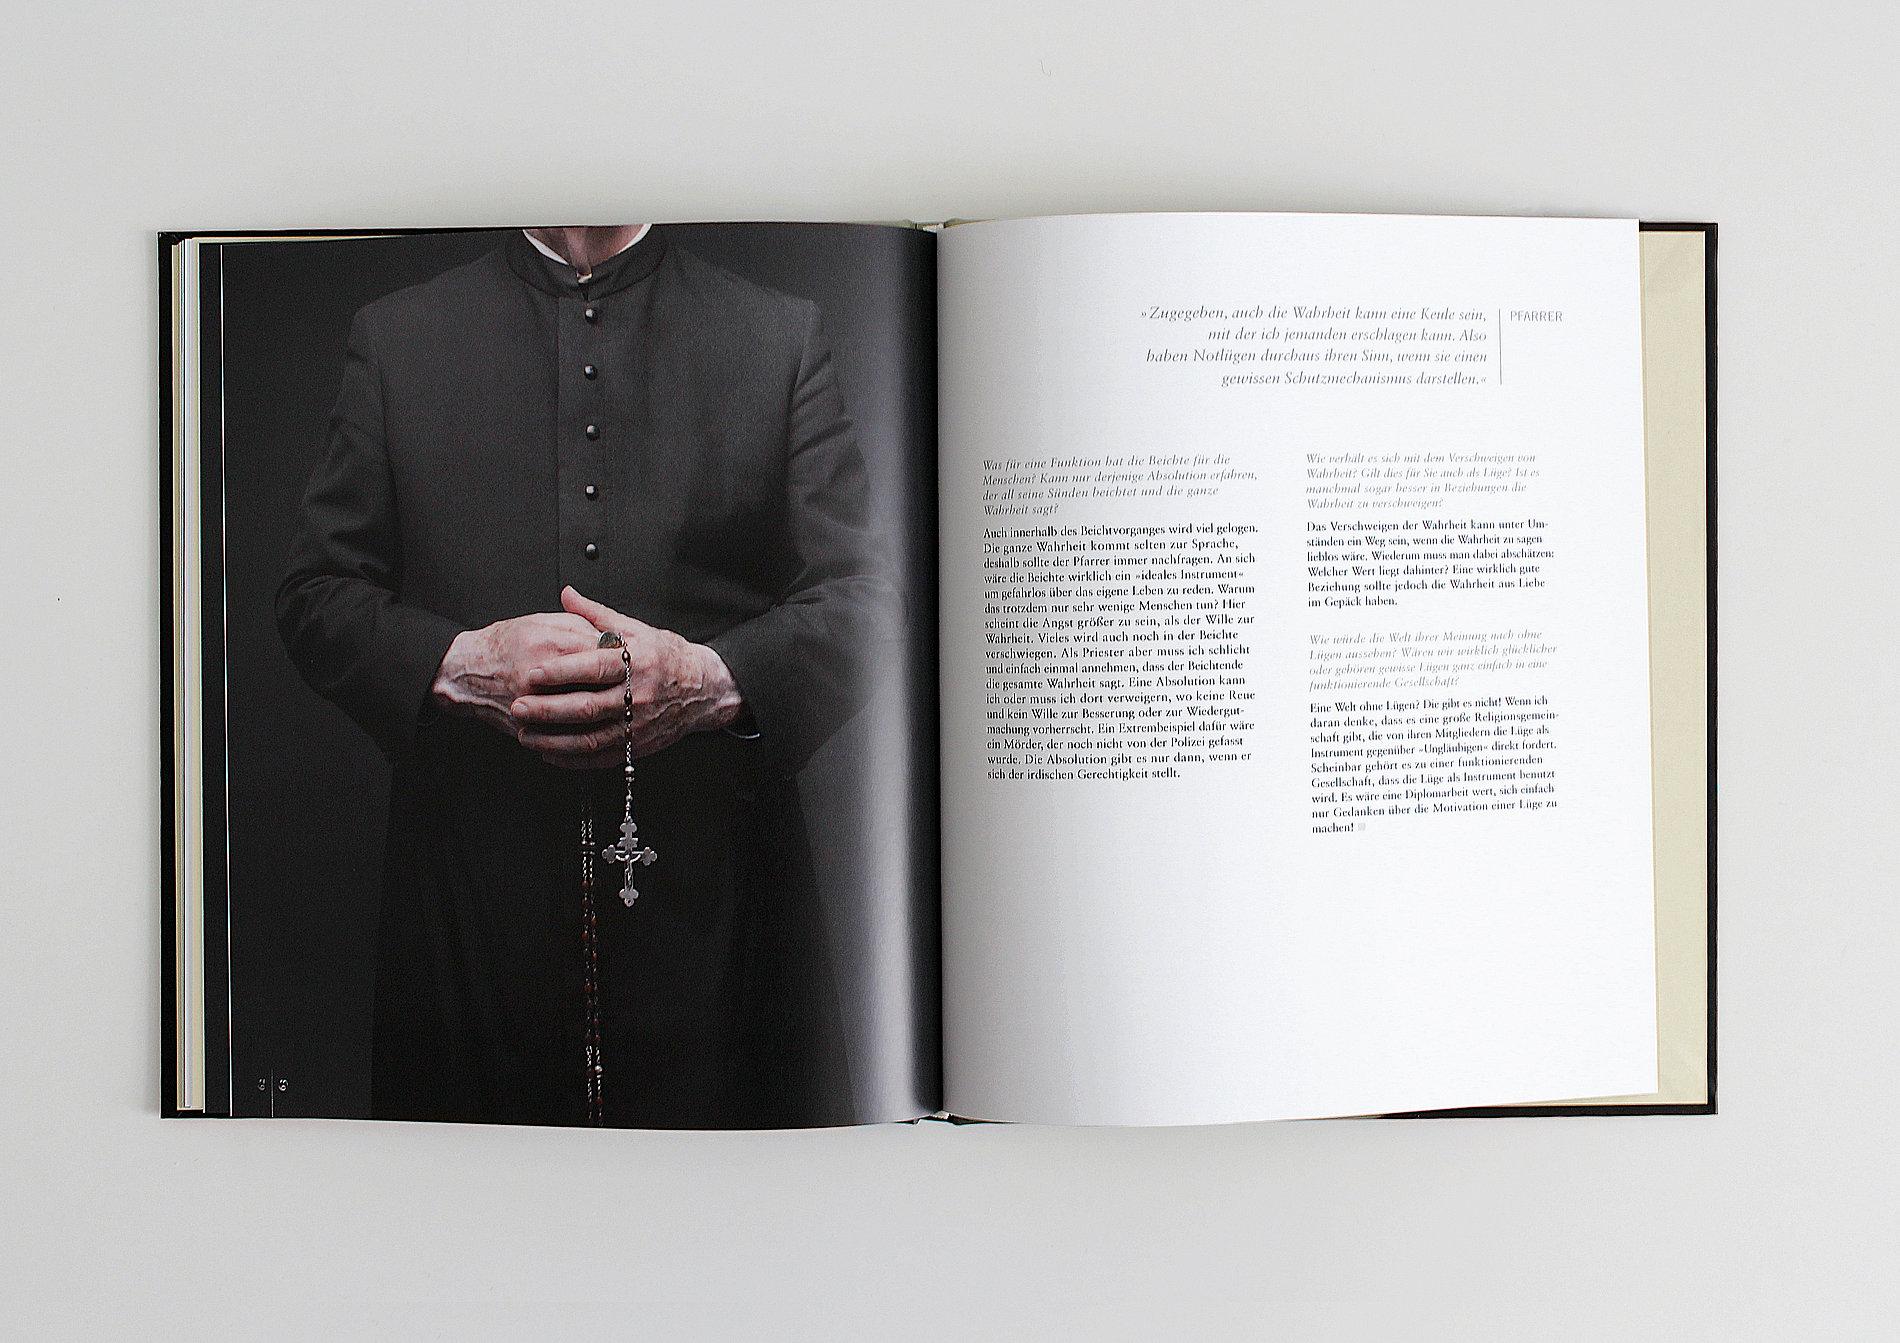 Lügnern auf der Spur How to Detect Liars | Red Dot Design Award